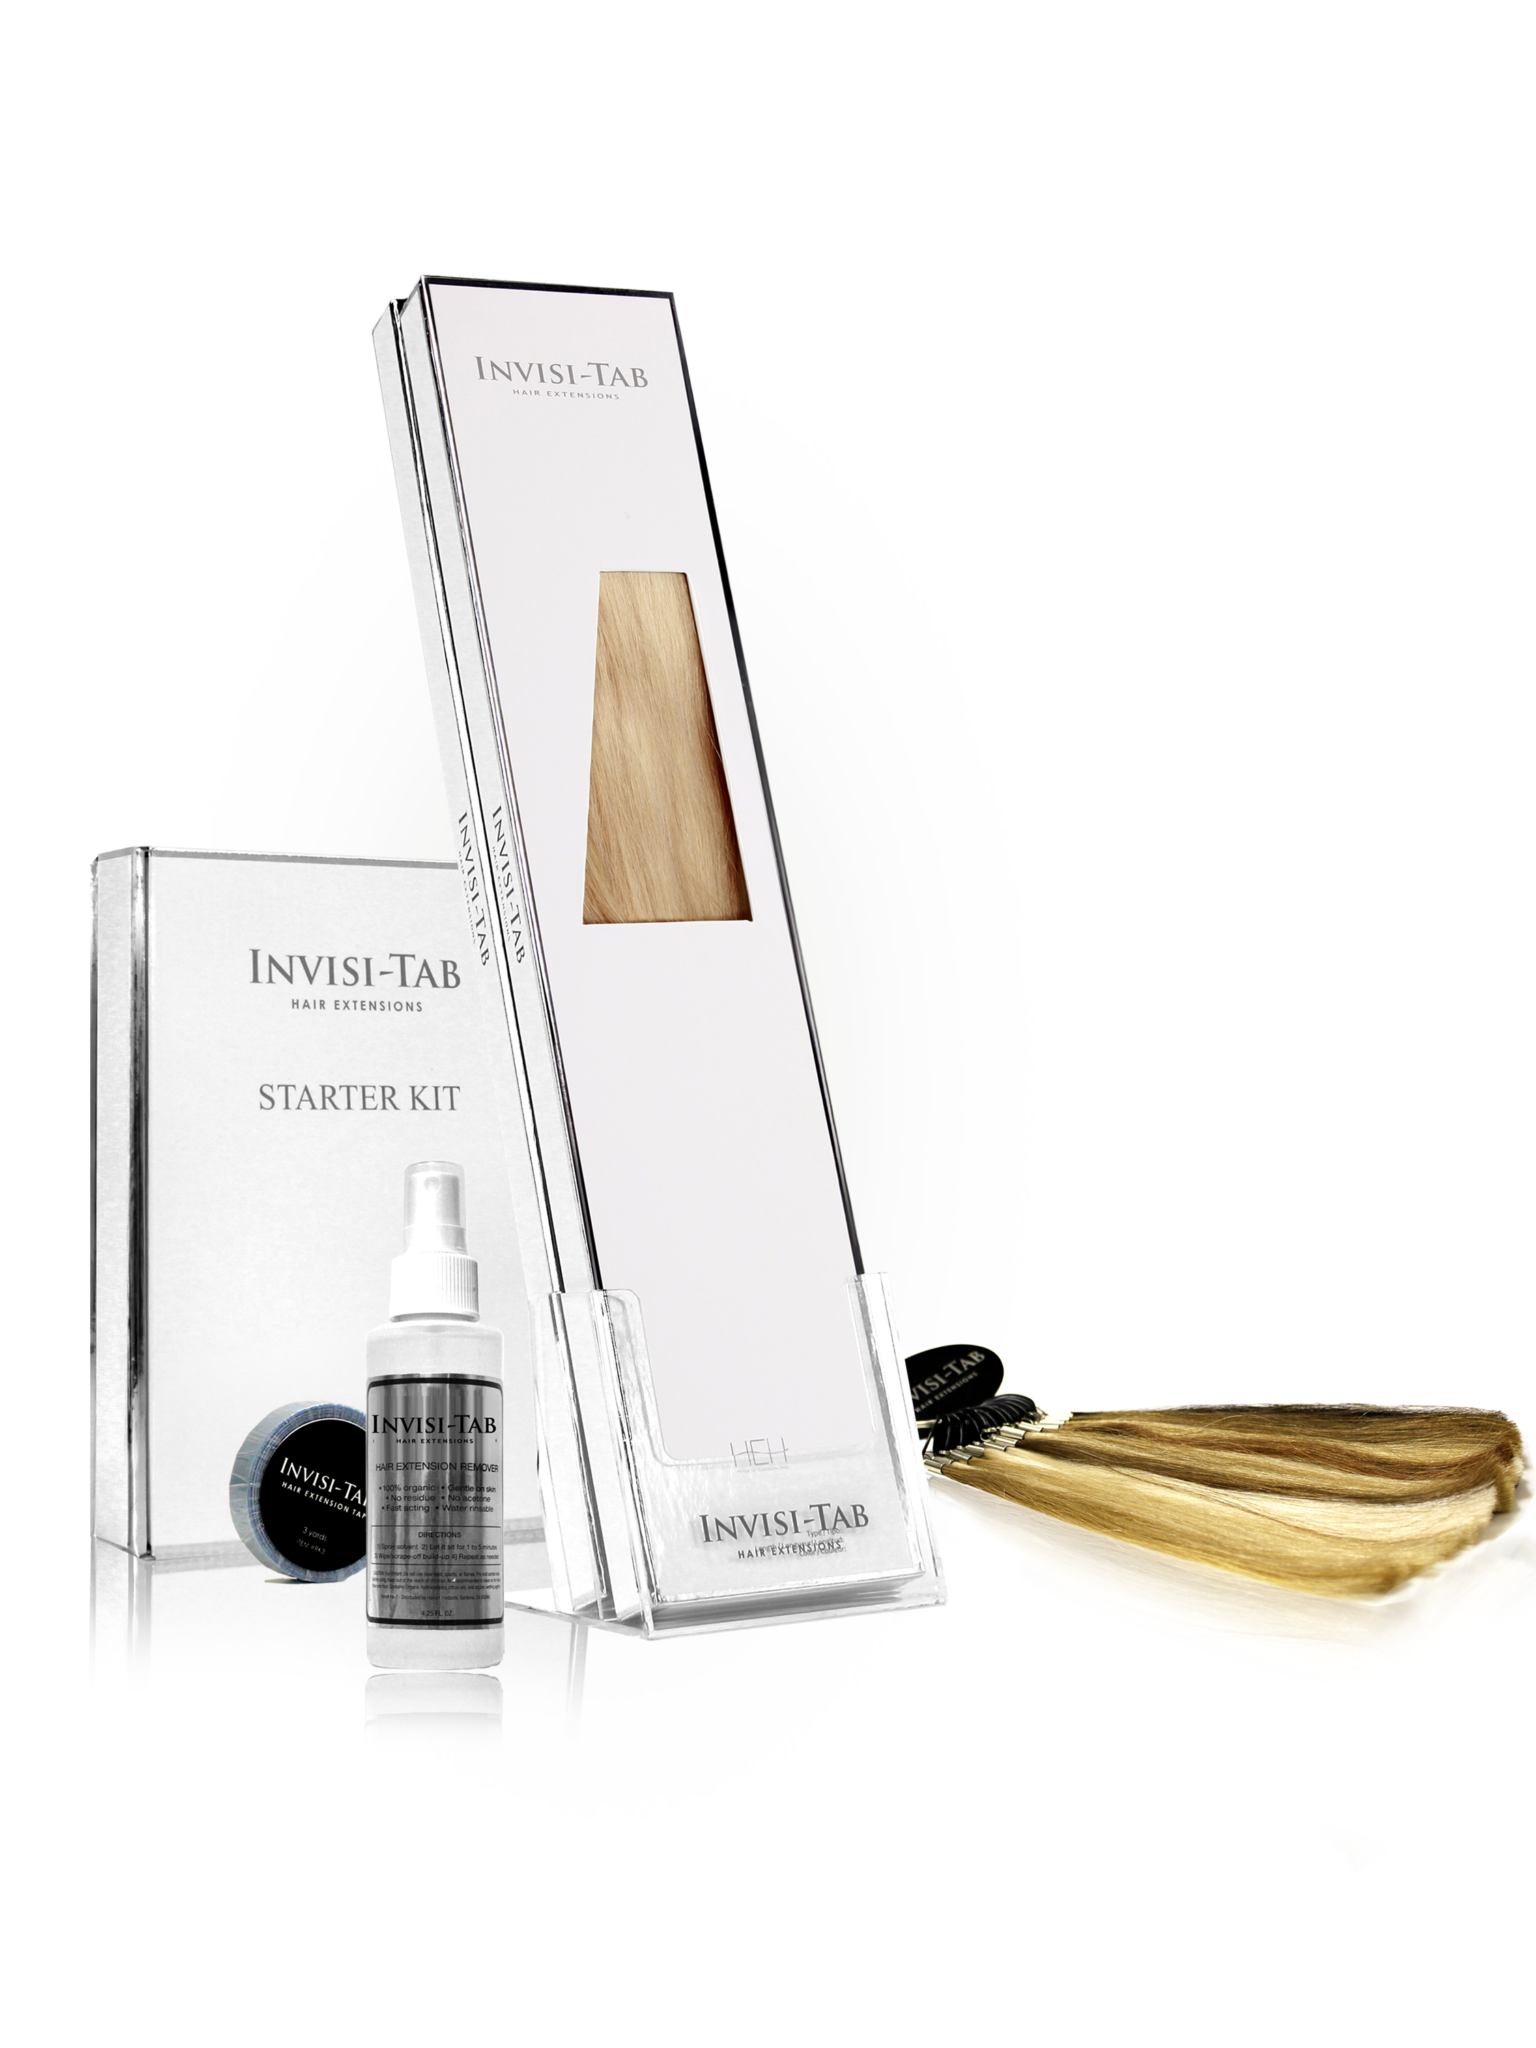 Invisi tab extensions exclusive salon products invisi tab european virgin hair pmusecretfo Choice Image